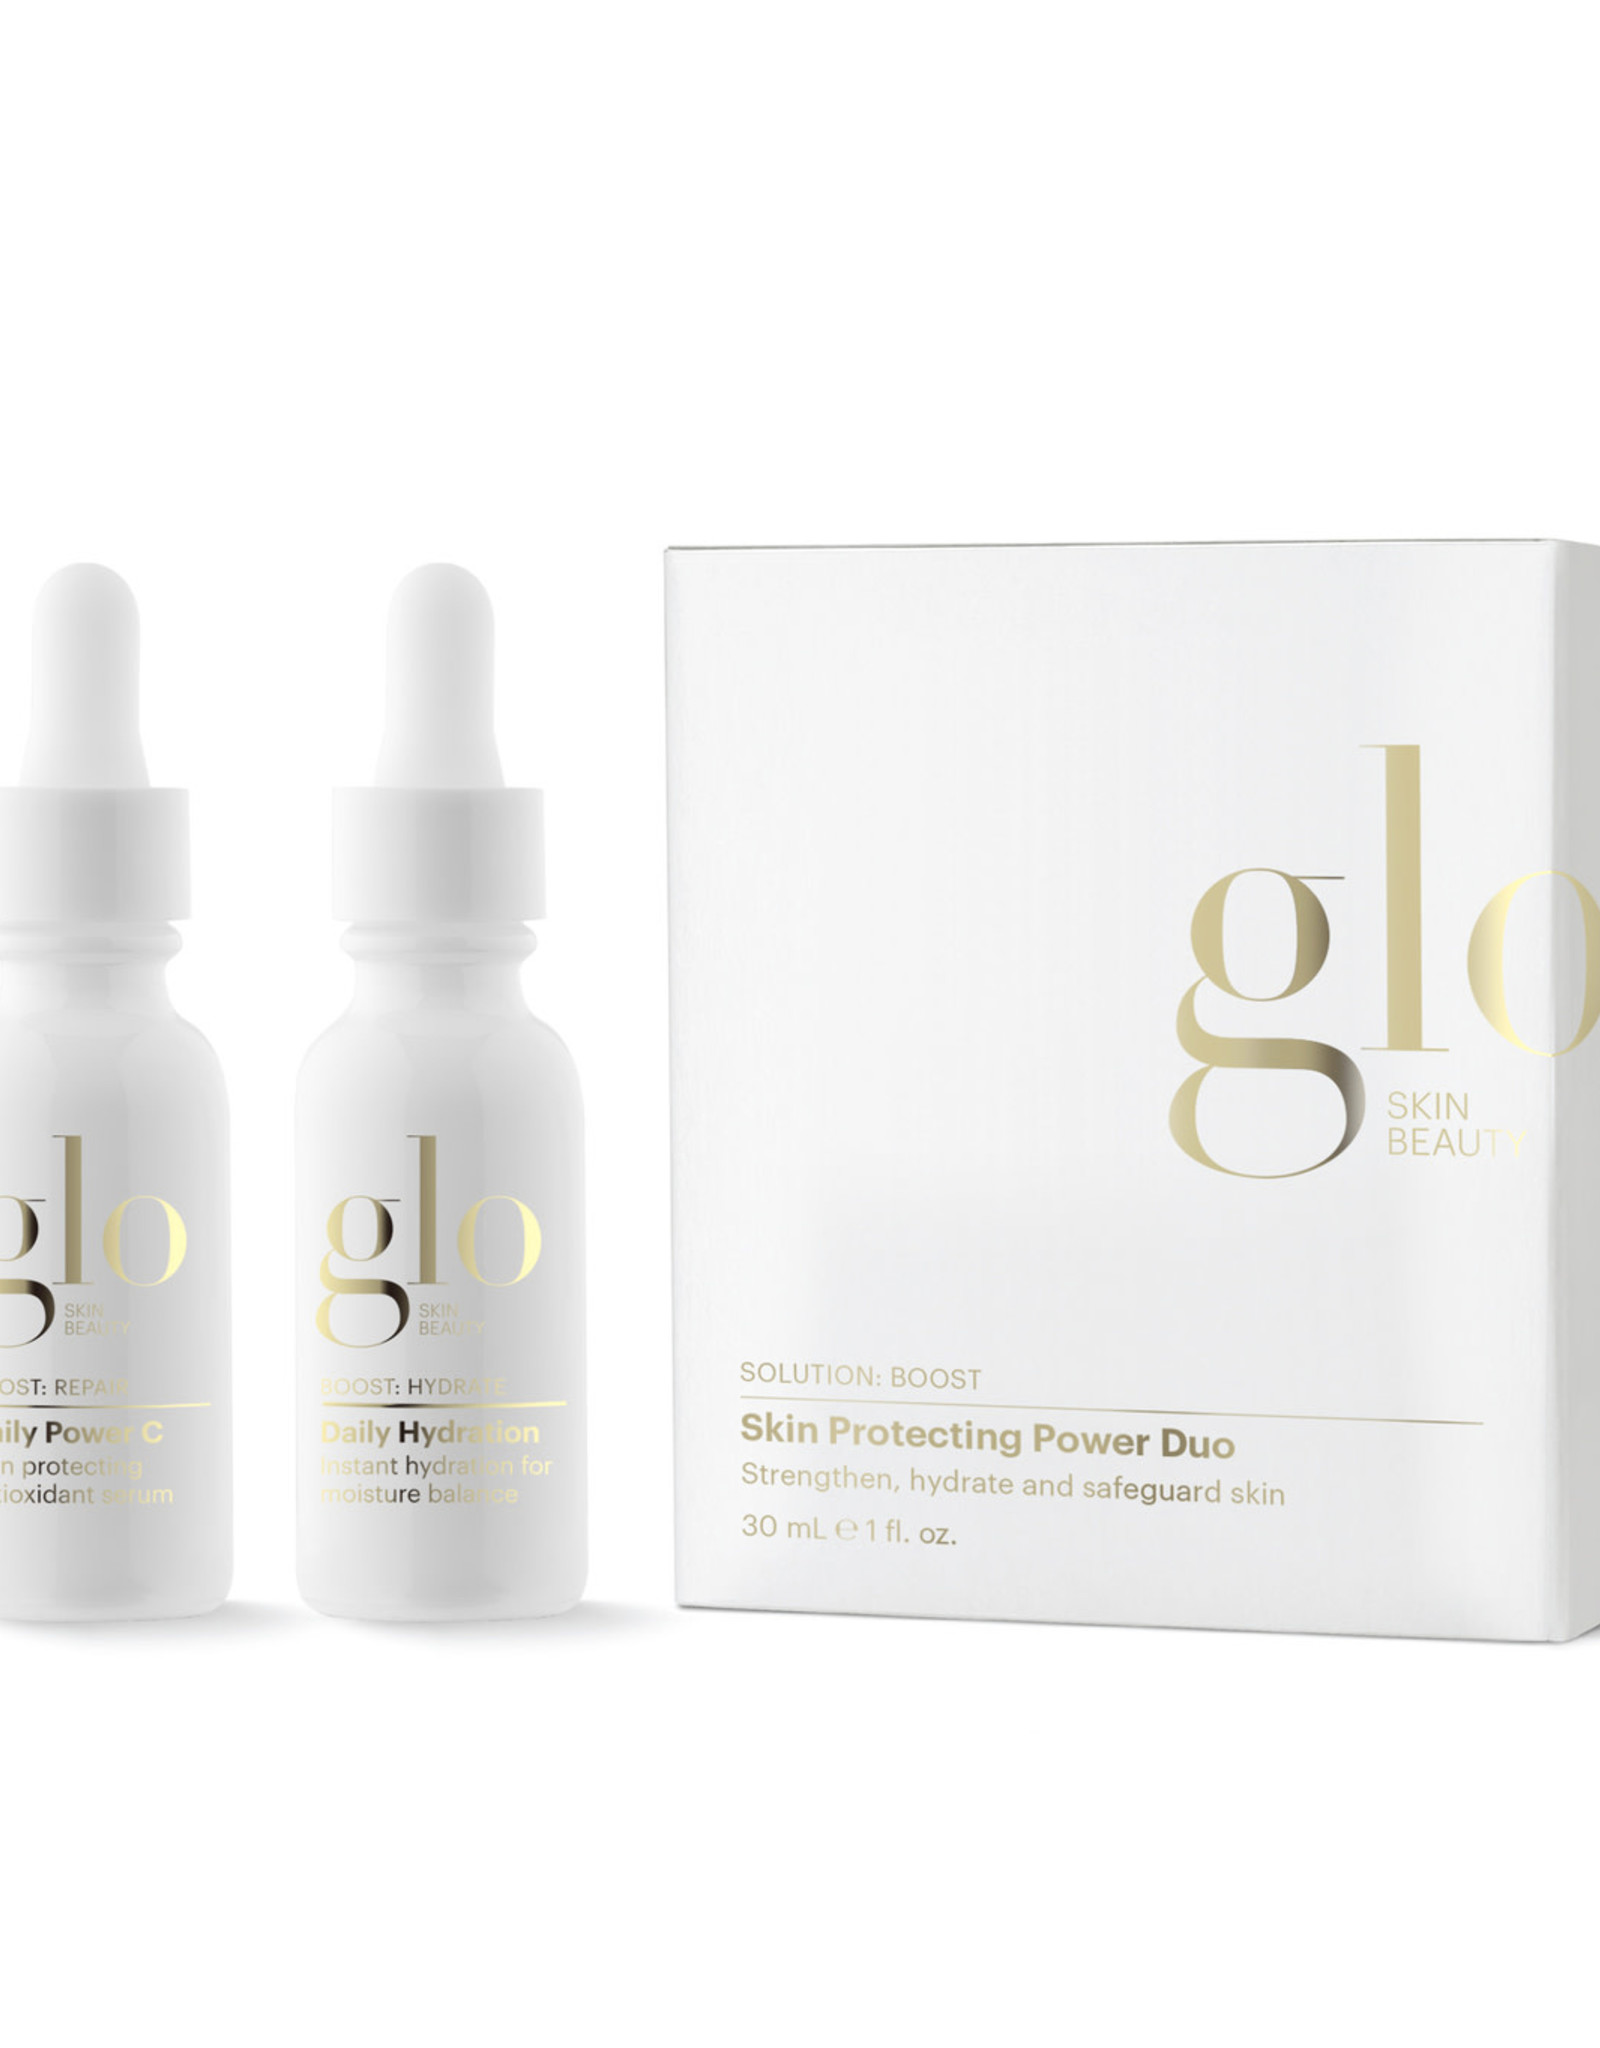 Glo Skin Beauty Skin Protecting Power Duo